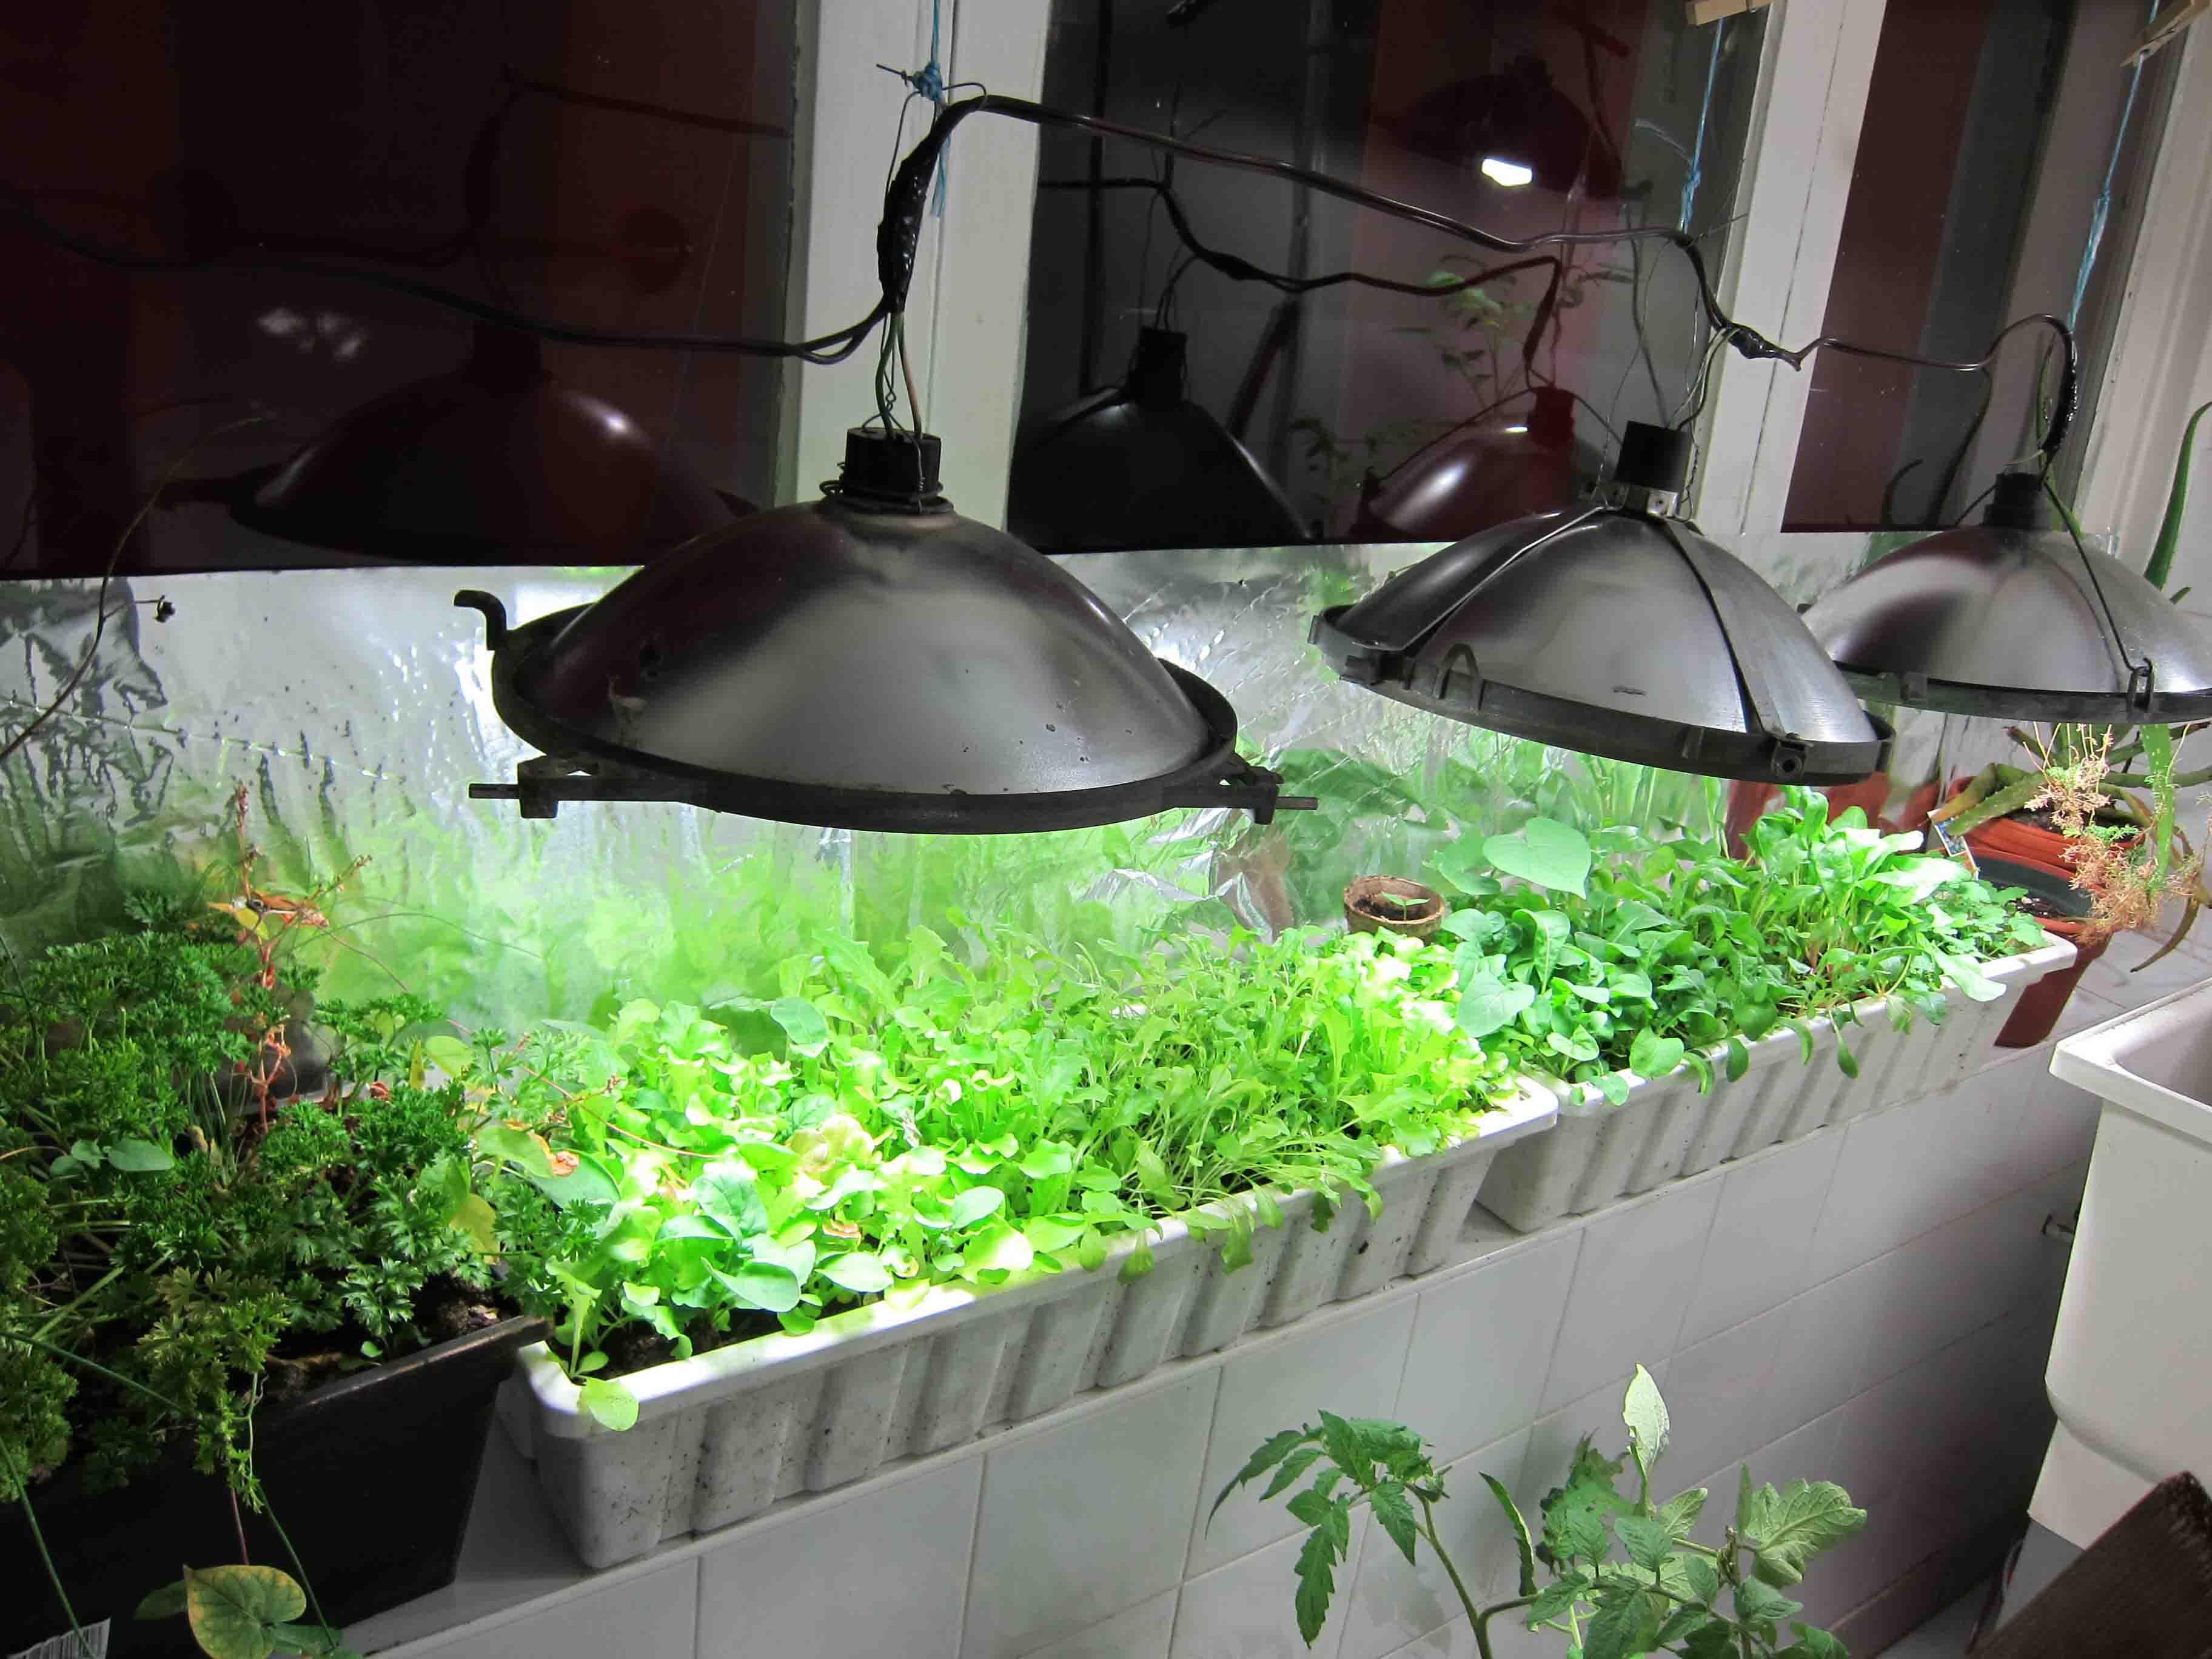 Flourscent Light Fixtures